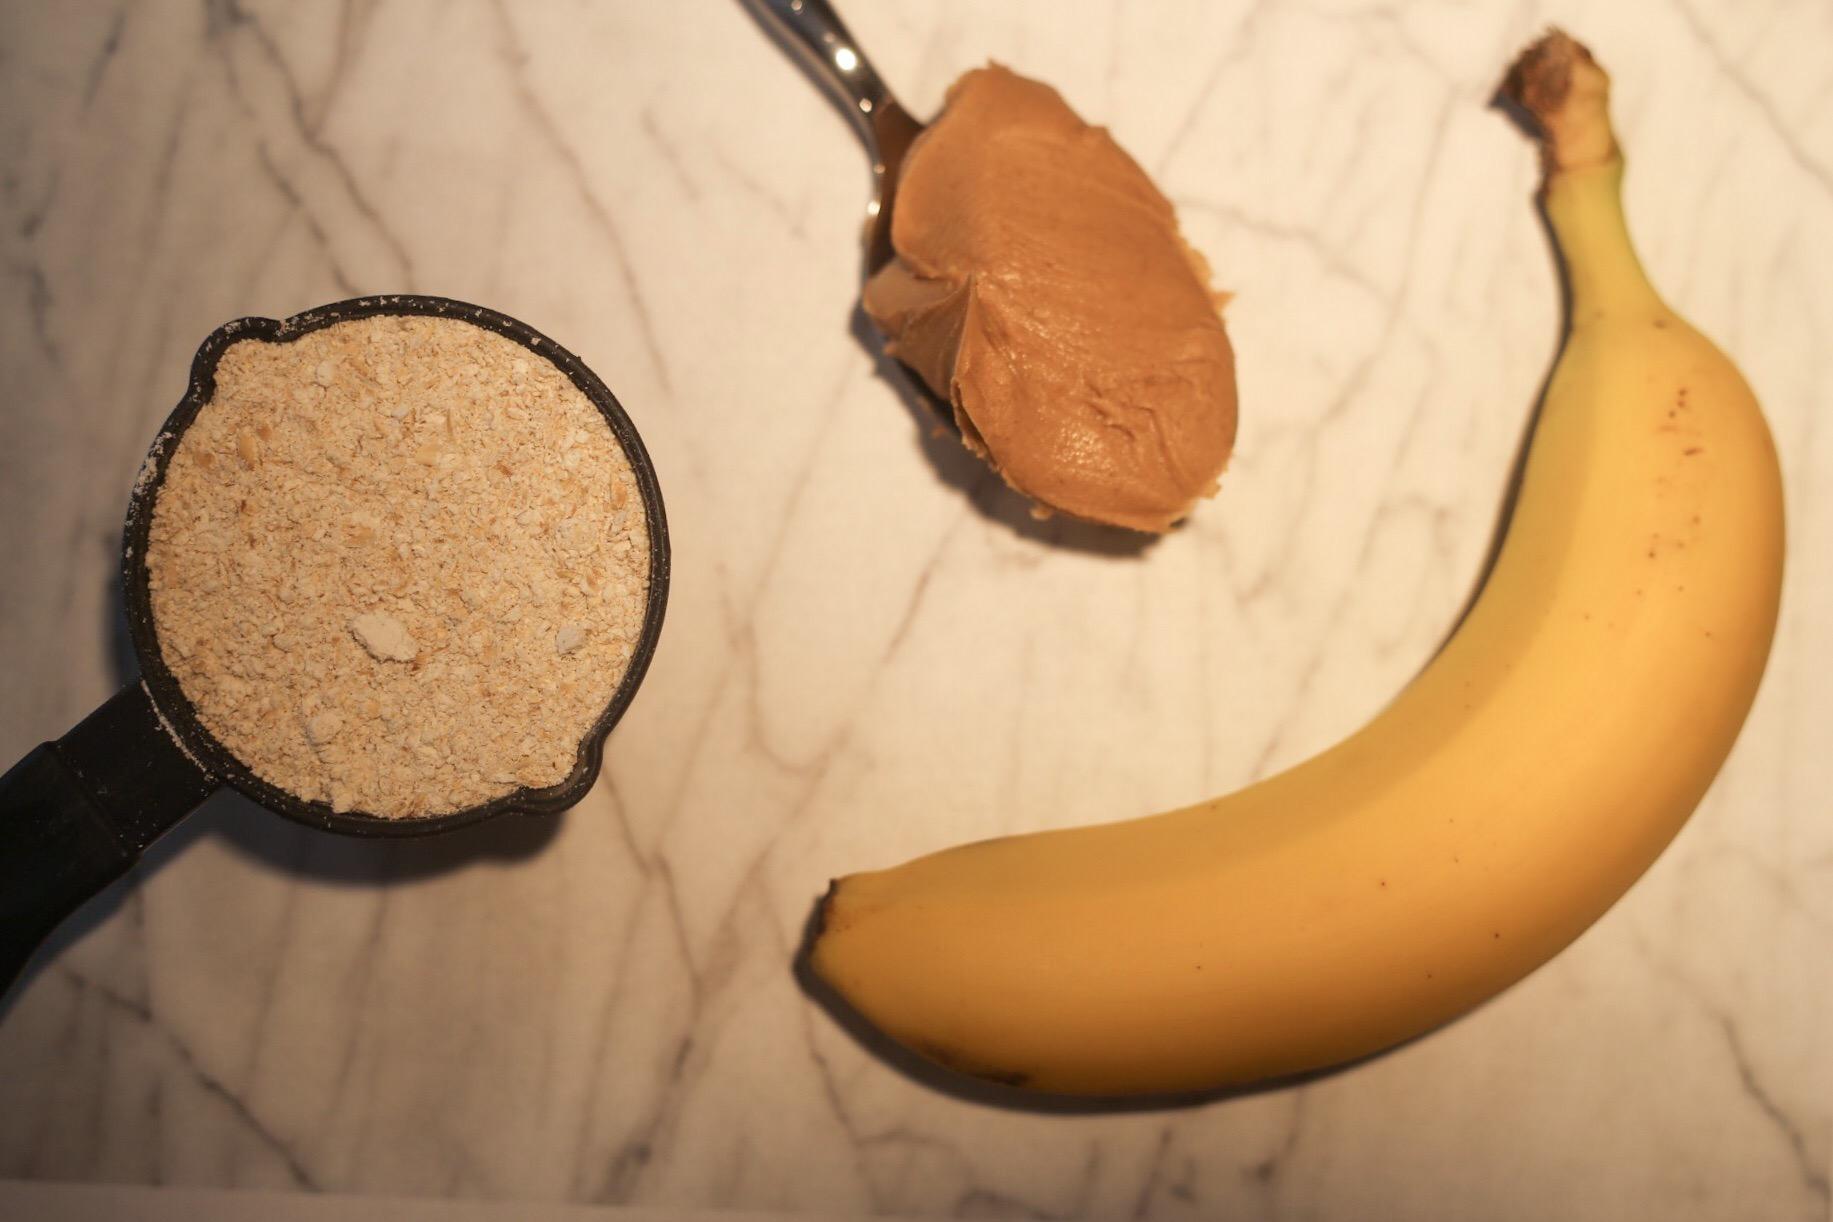 oats, peanut butter, and banana for dog treats